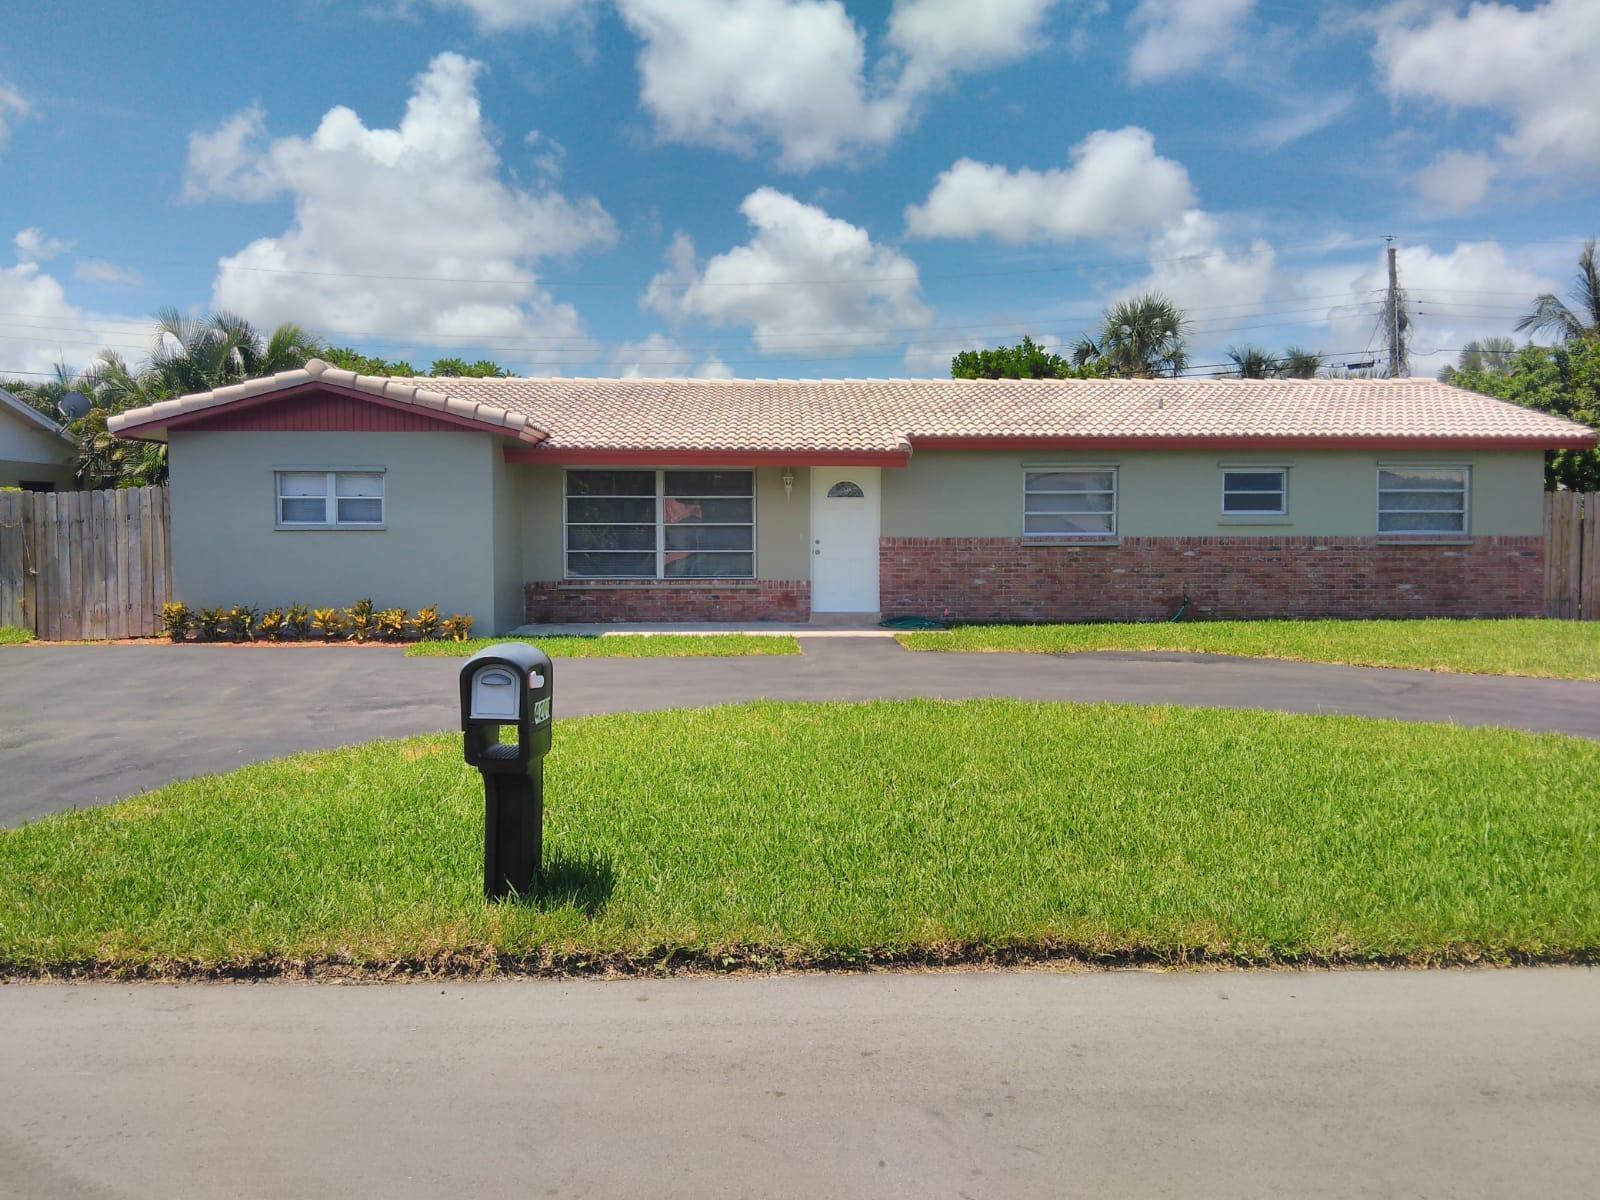 4209 Nw 2nd Court Boca Raton, FL 33431